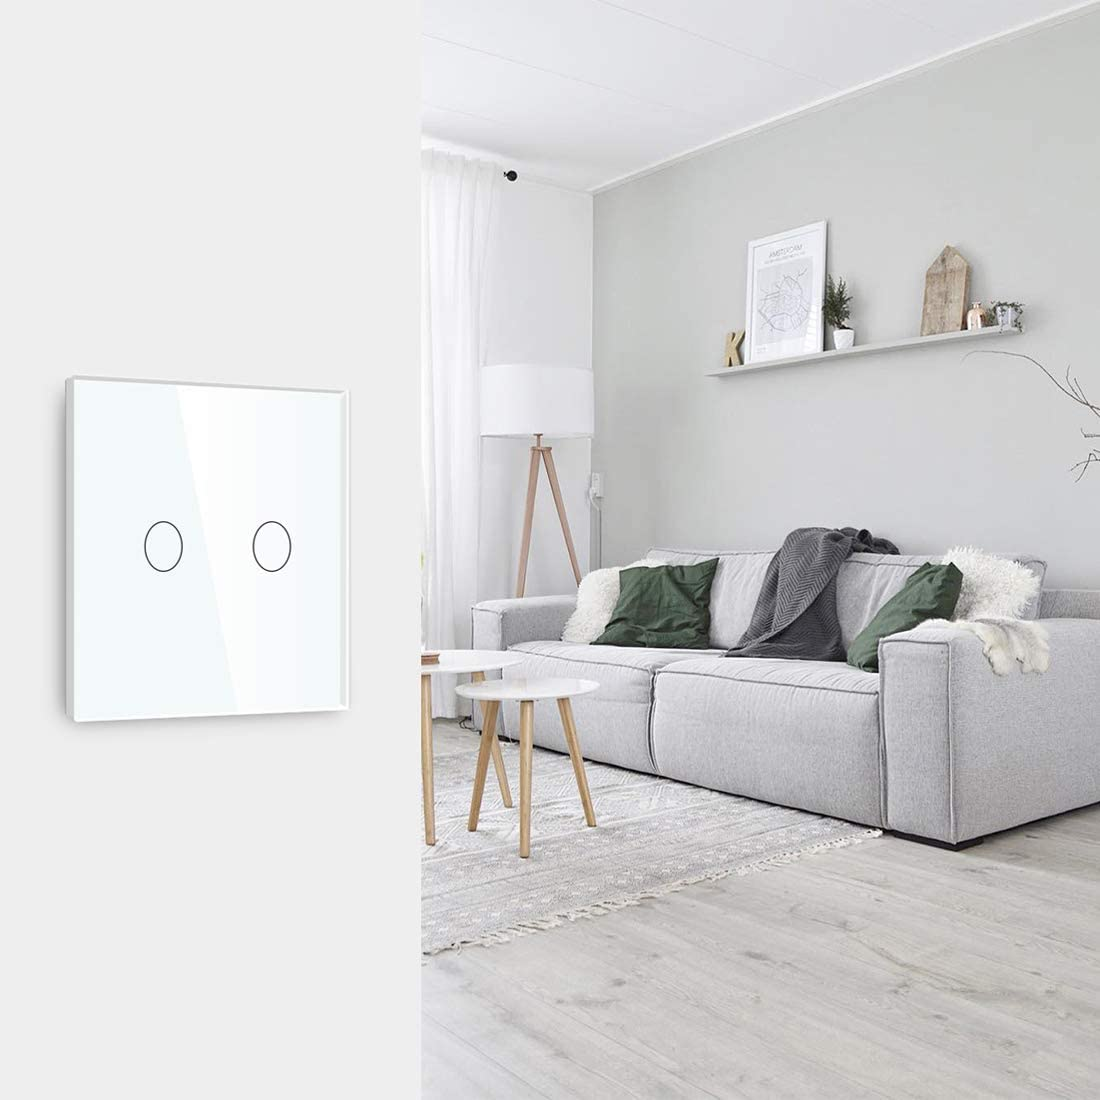 Adaptador Led requerido BSEED Interruptor regulador de luz 1 Gang 1 Way LED Dimmer Switch Interruptor de luz con pantalla t/áctil interruptor t/áctil de pared Negro